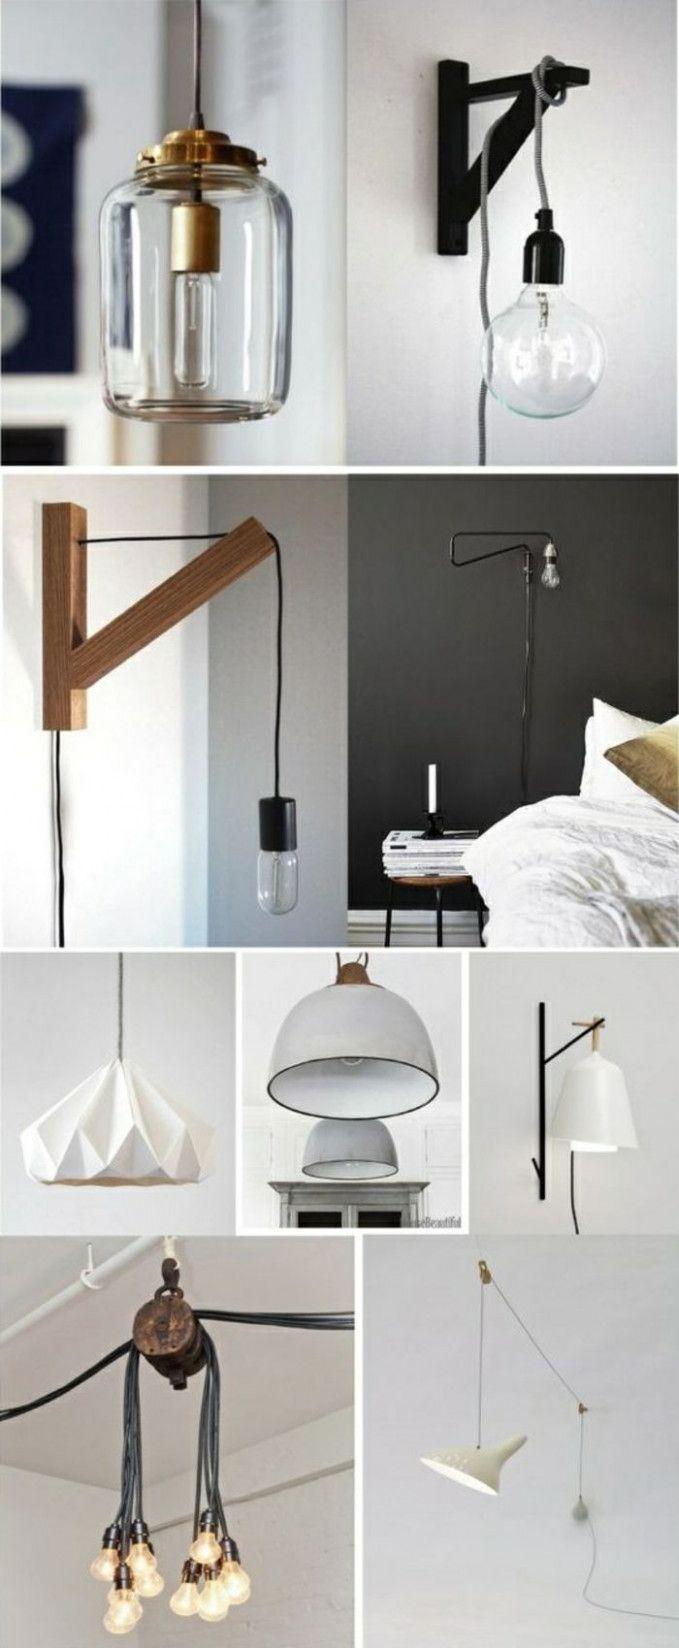 Exklusive Schlafzimmer Lampen Lampu Gantung Ide Bagus Desain